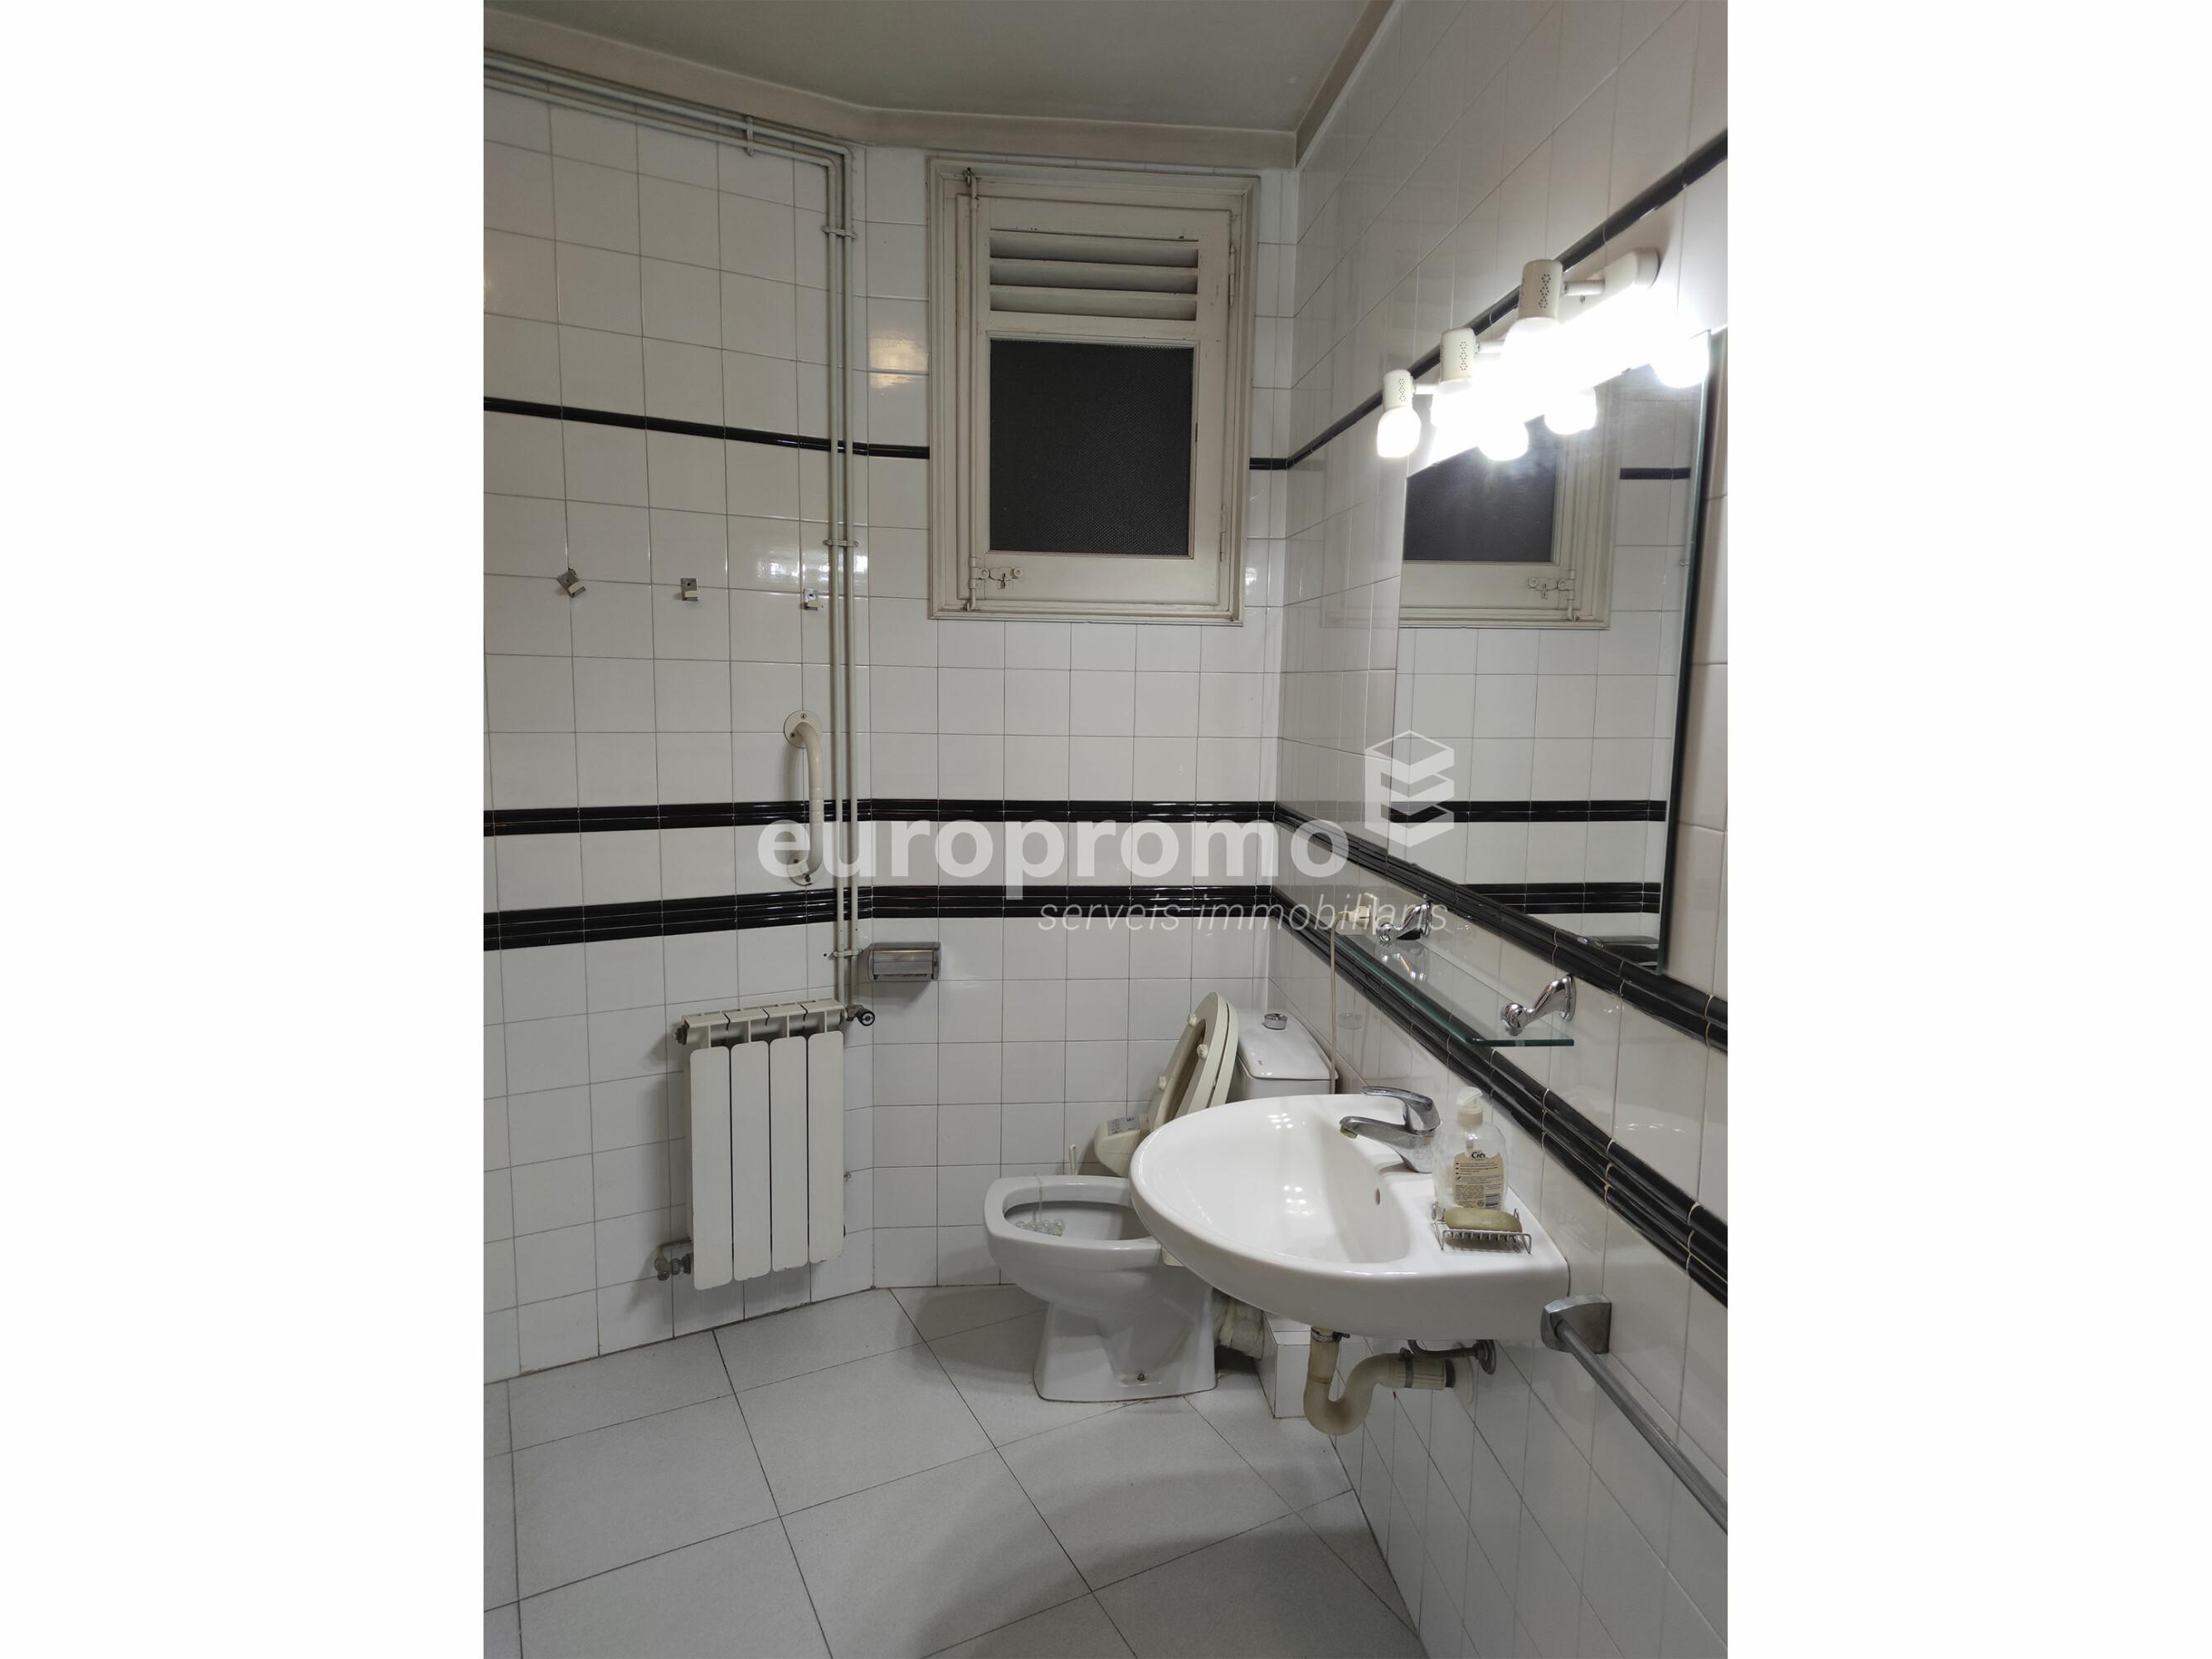 Fantàstic pis de 115 m² a l'Eixample Nord